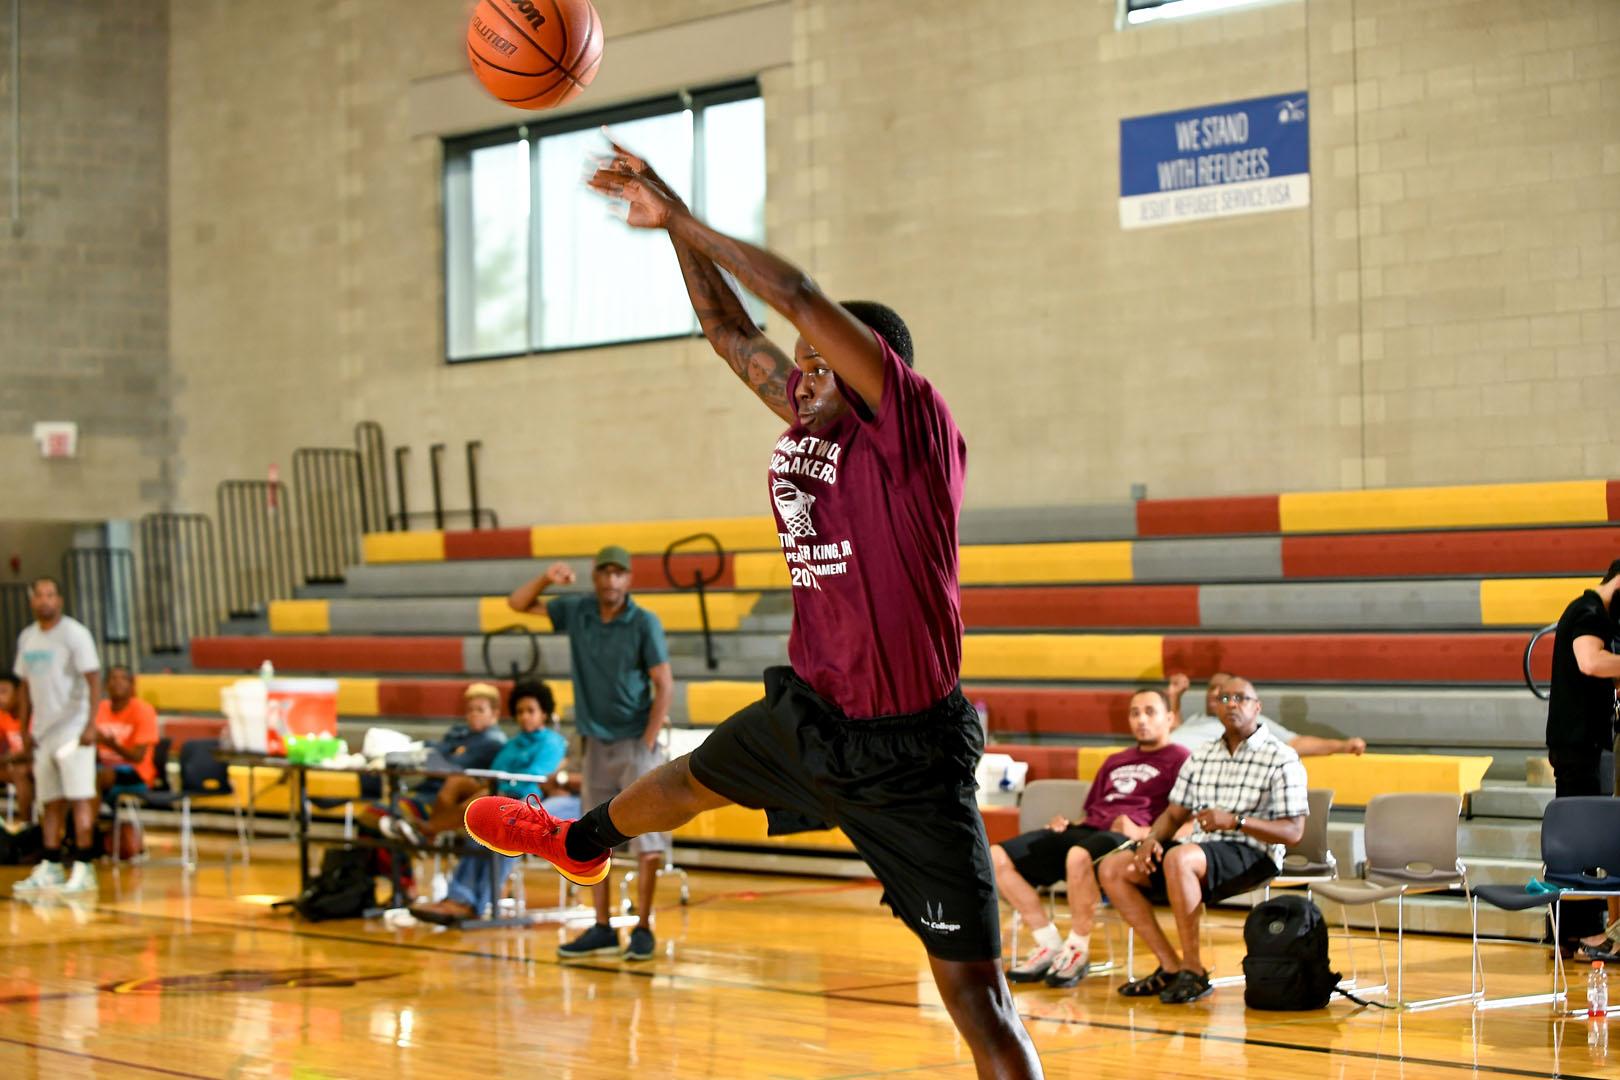 LNBasketball-30339.jpg